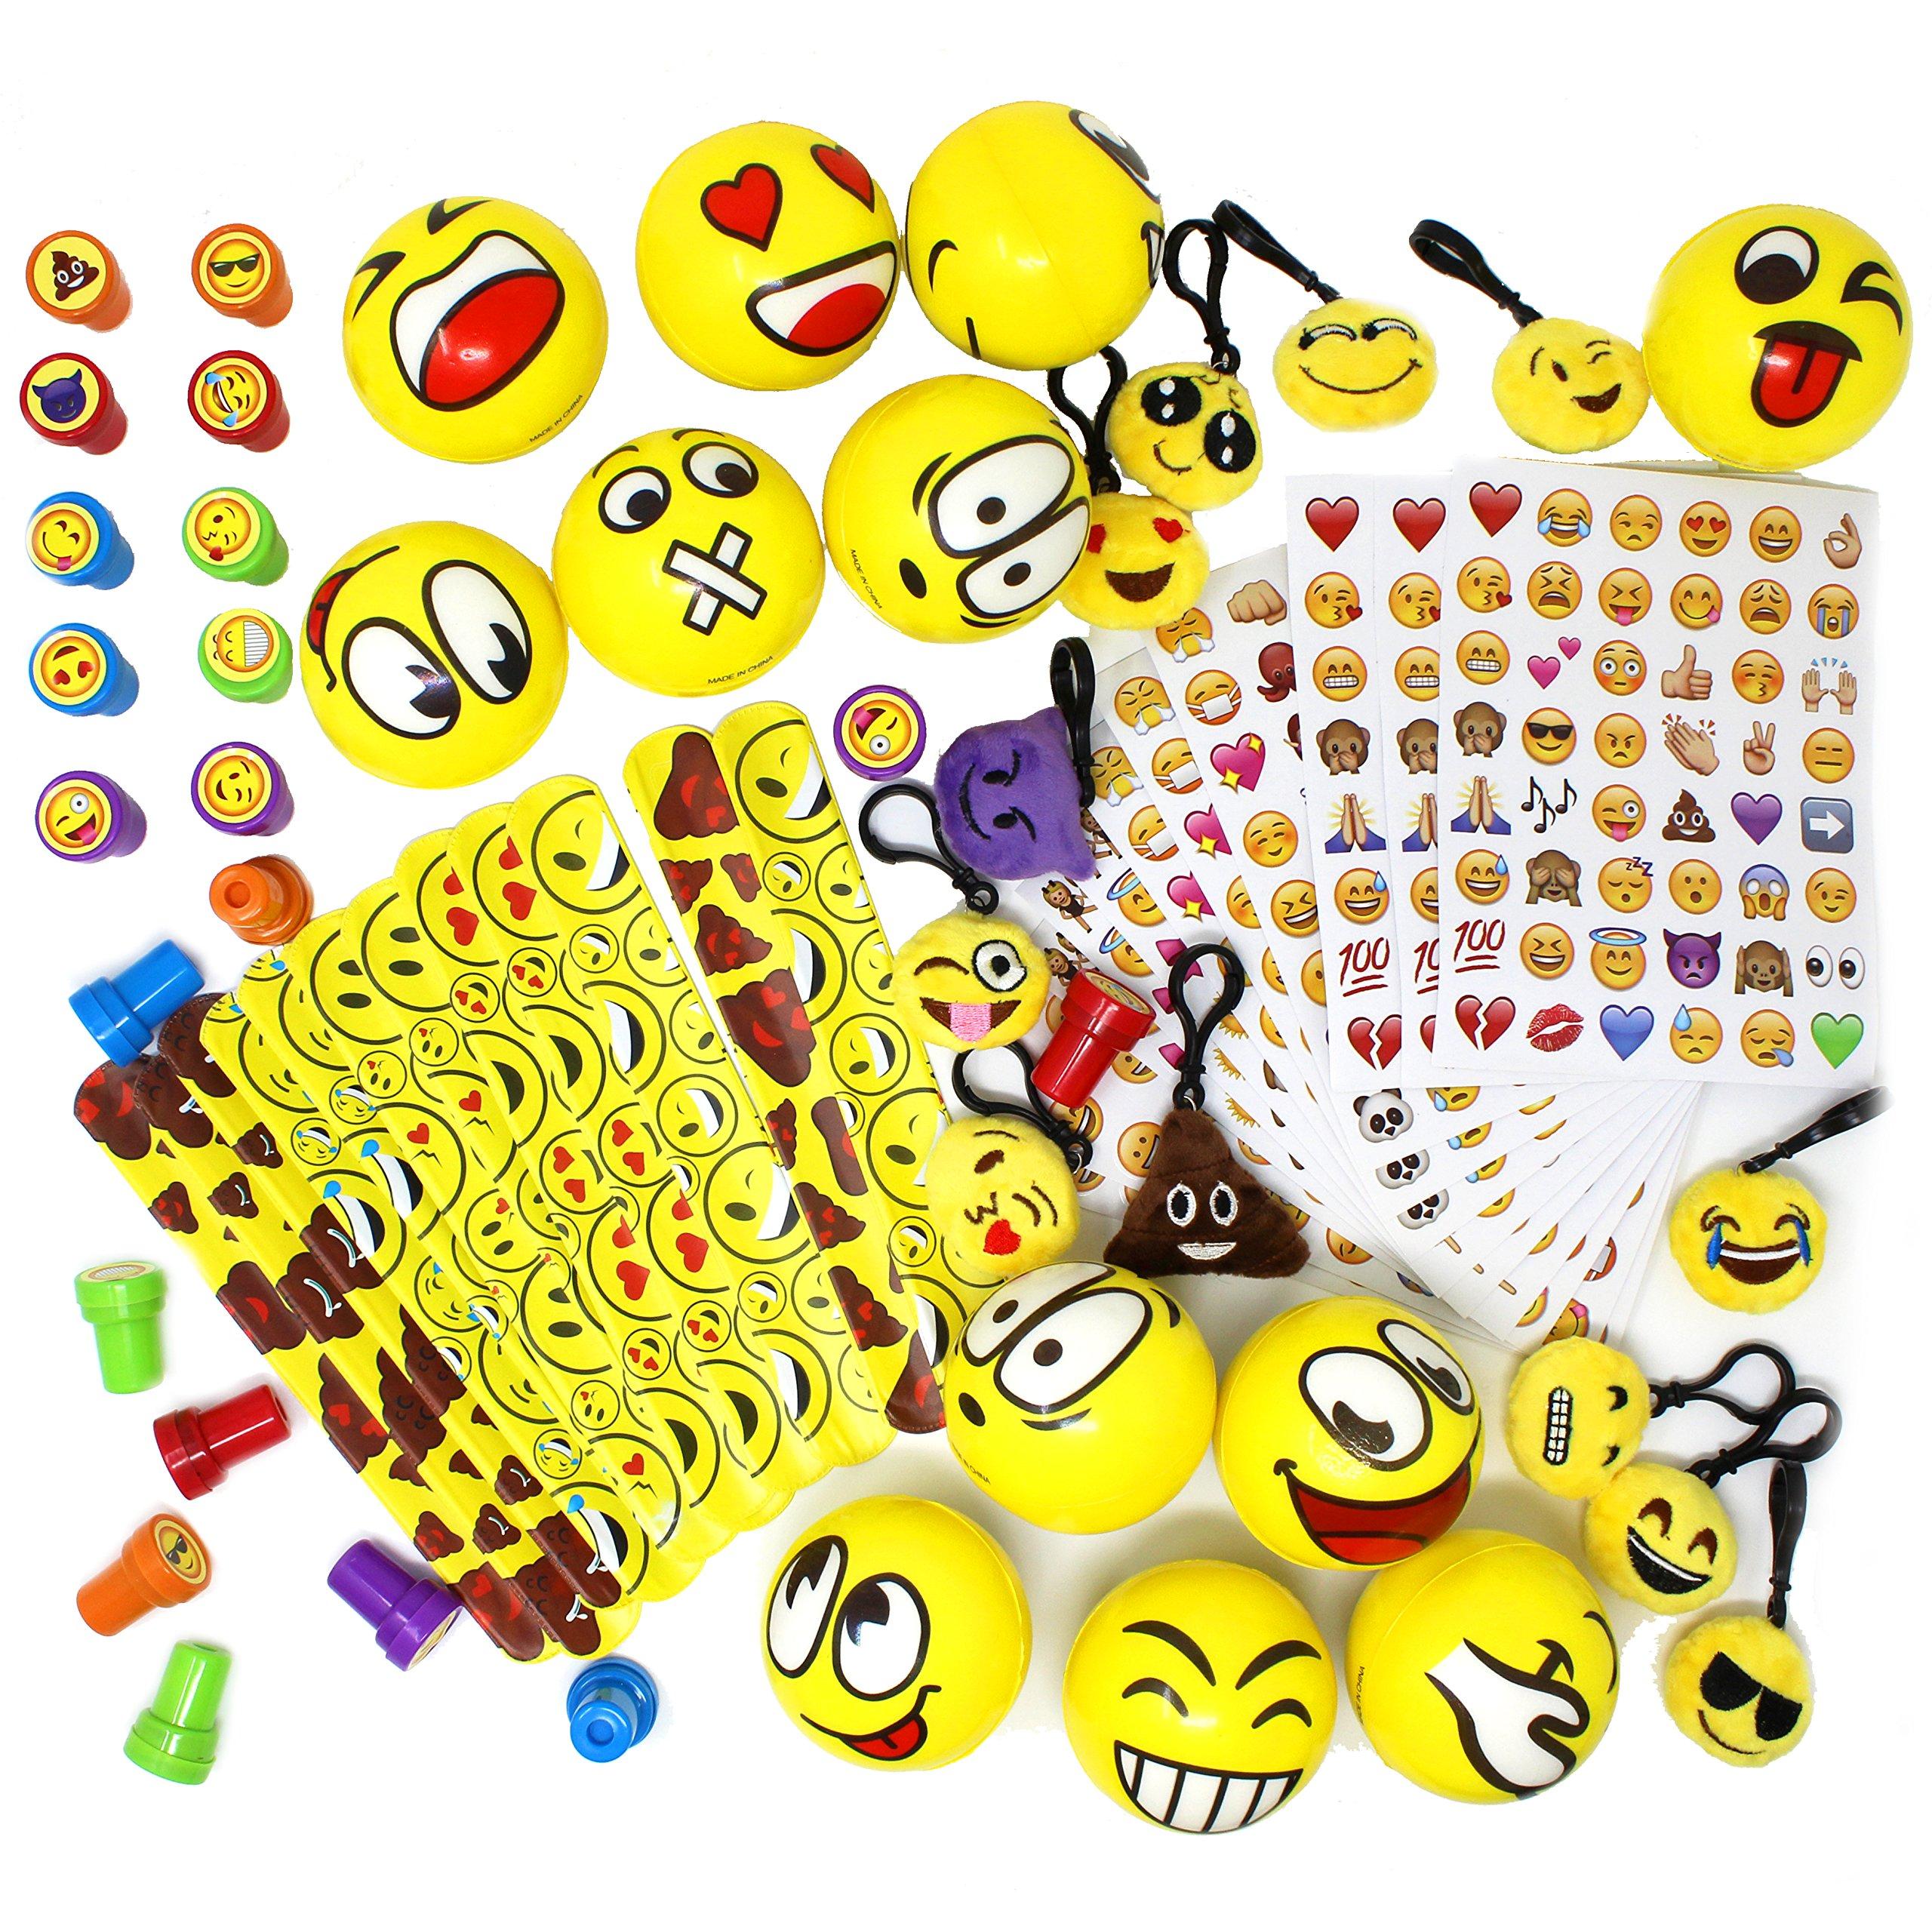 Joyin Toy 68 Pieces Assorted Kids Emoji Birthday Party Supply Children Emoji Stress Relief Toys